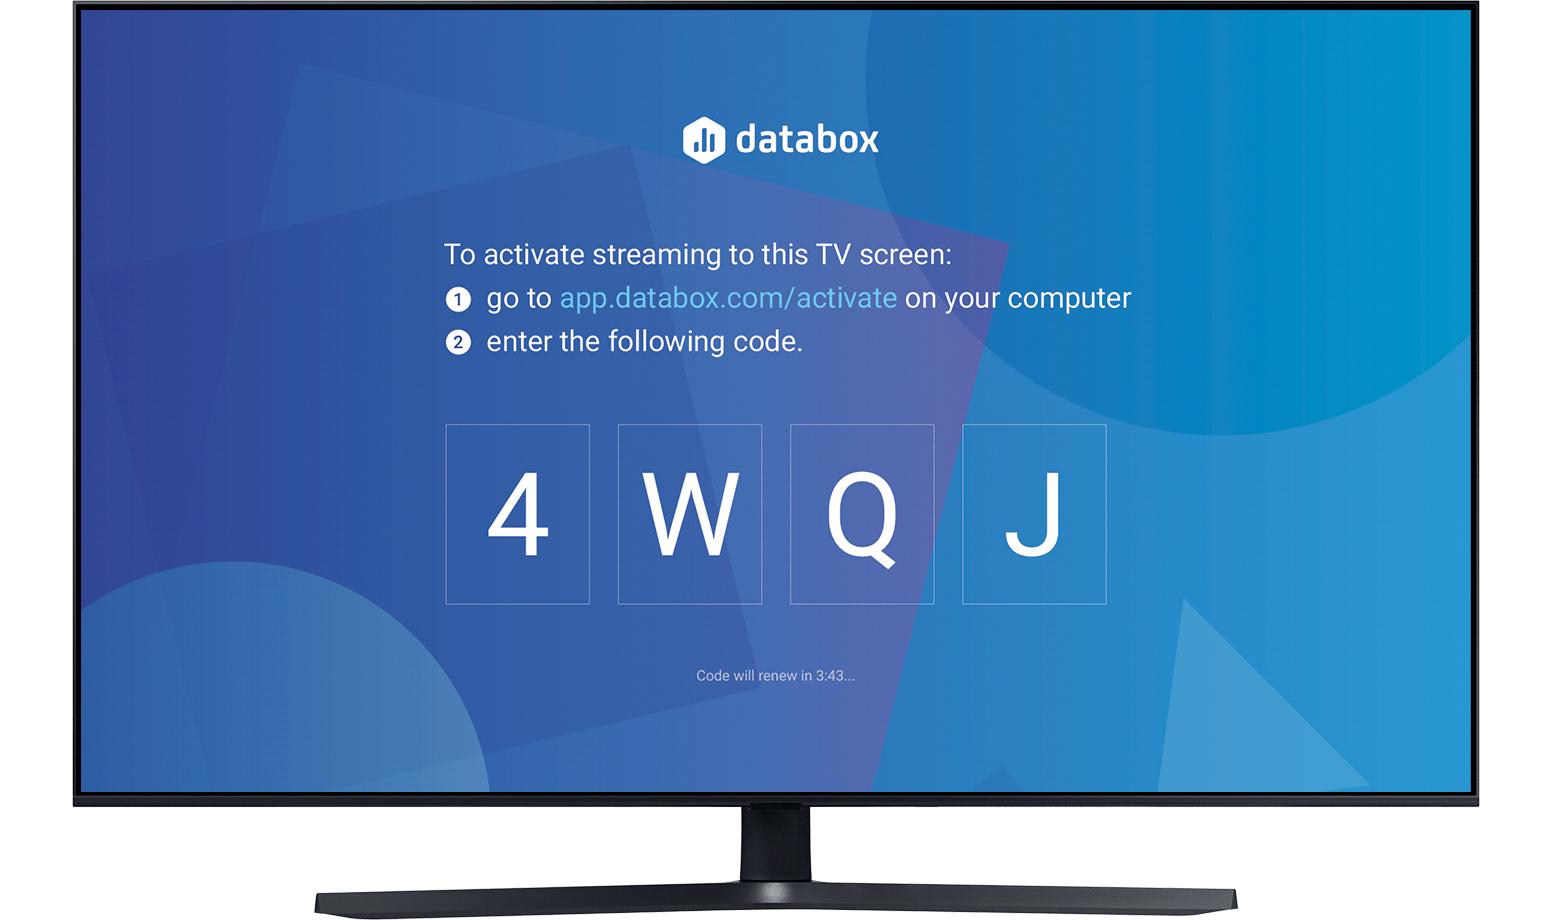 Visit tv.databox.com and receive your unique 4-digit code